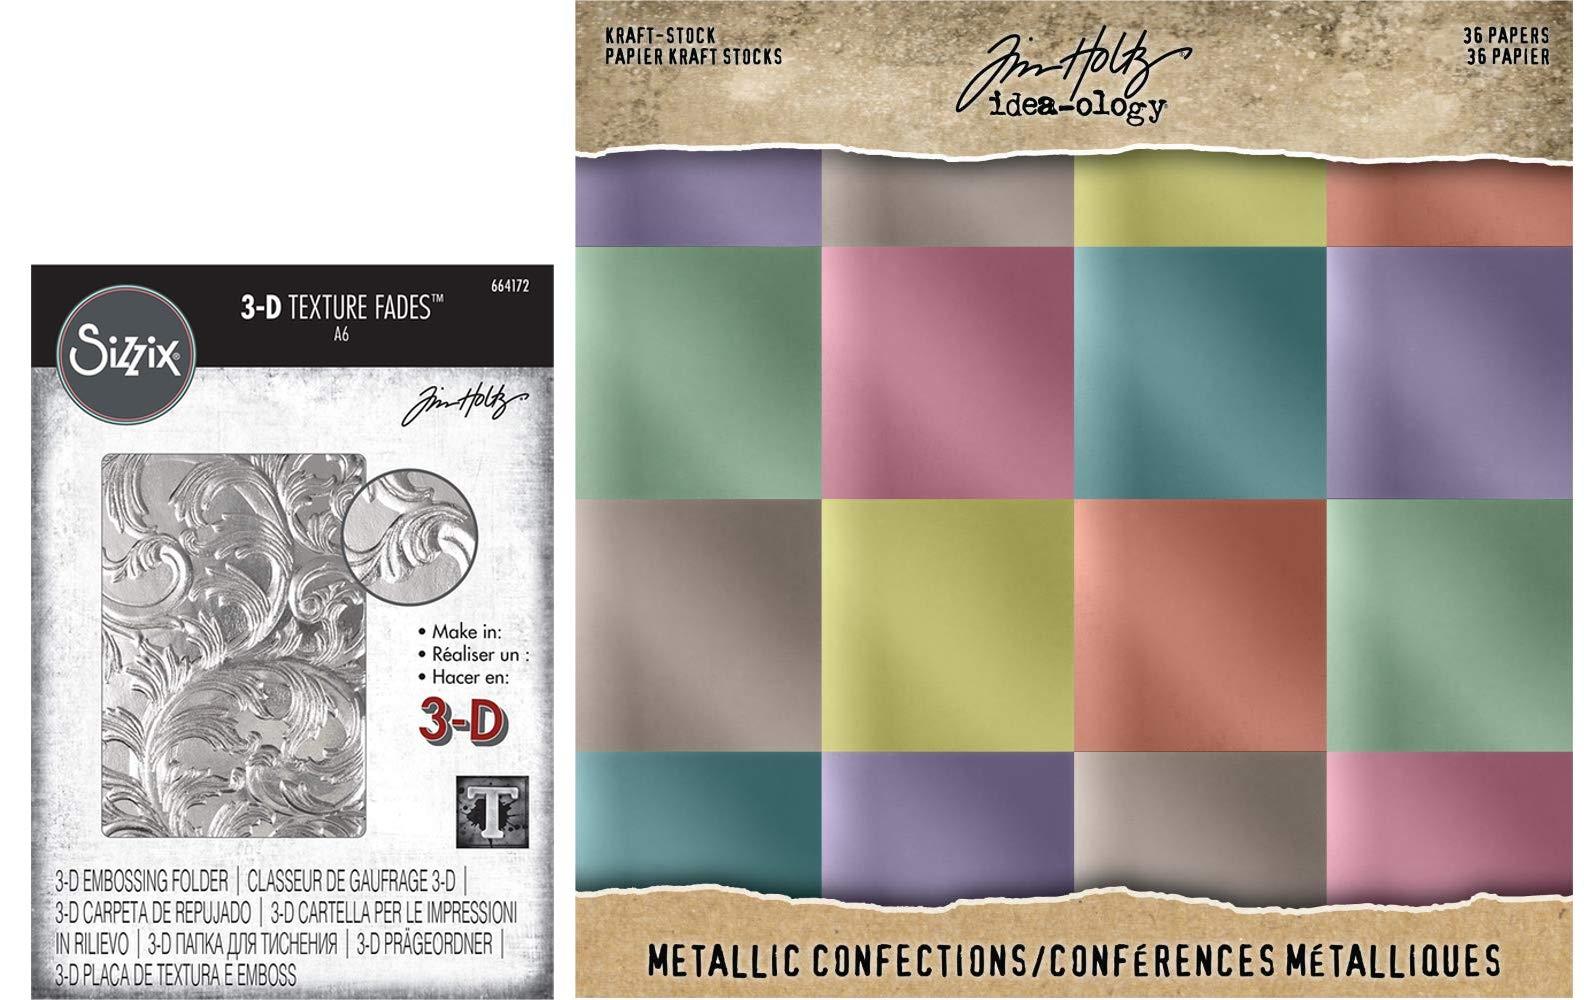 Tim Holtz Sizzix - Elegant 3D Embossing Folder and Idea-Ology Confections Metallic Kraft Cardstock - 2 Items